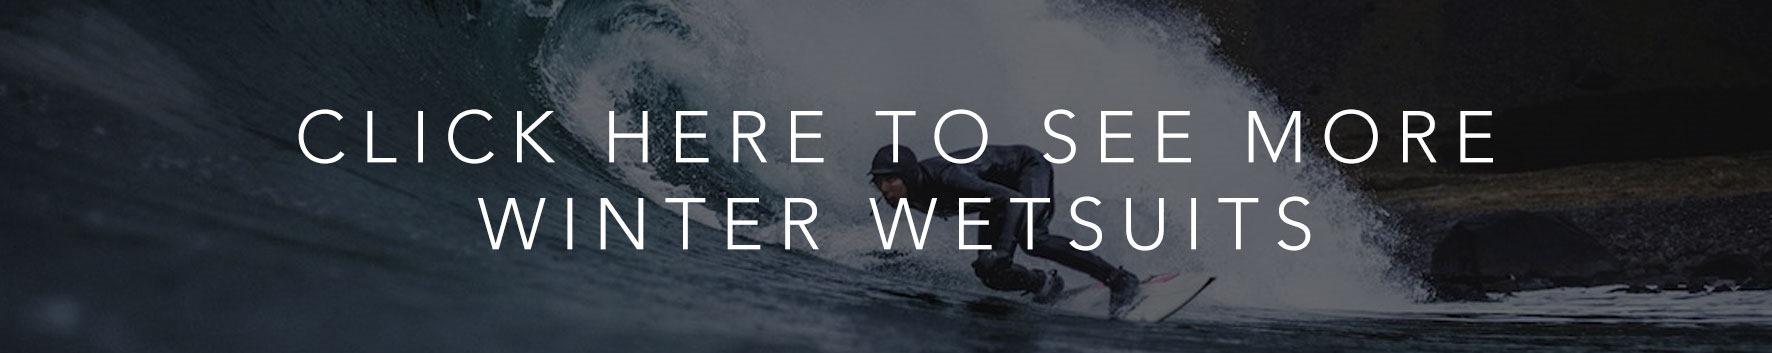 winter wetsuits from secret spot surf shop